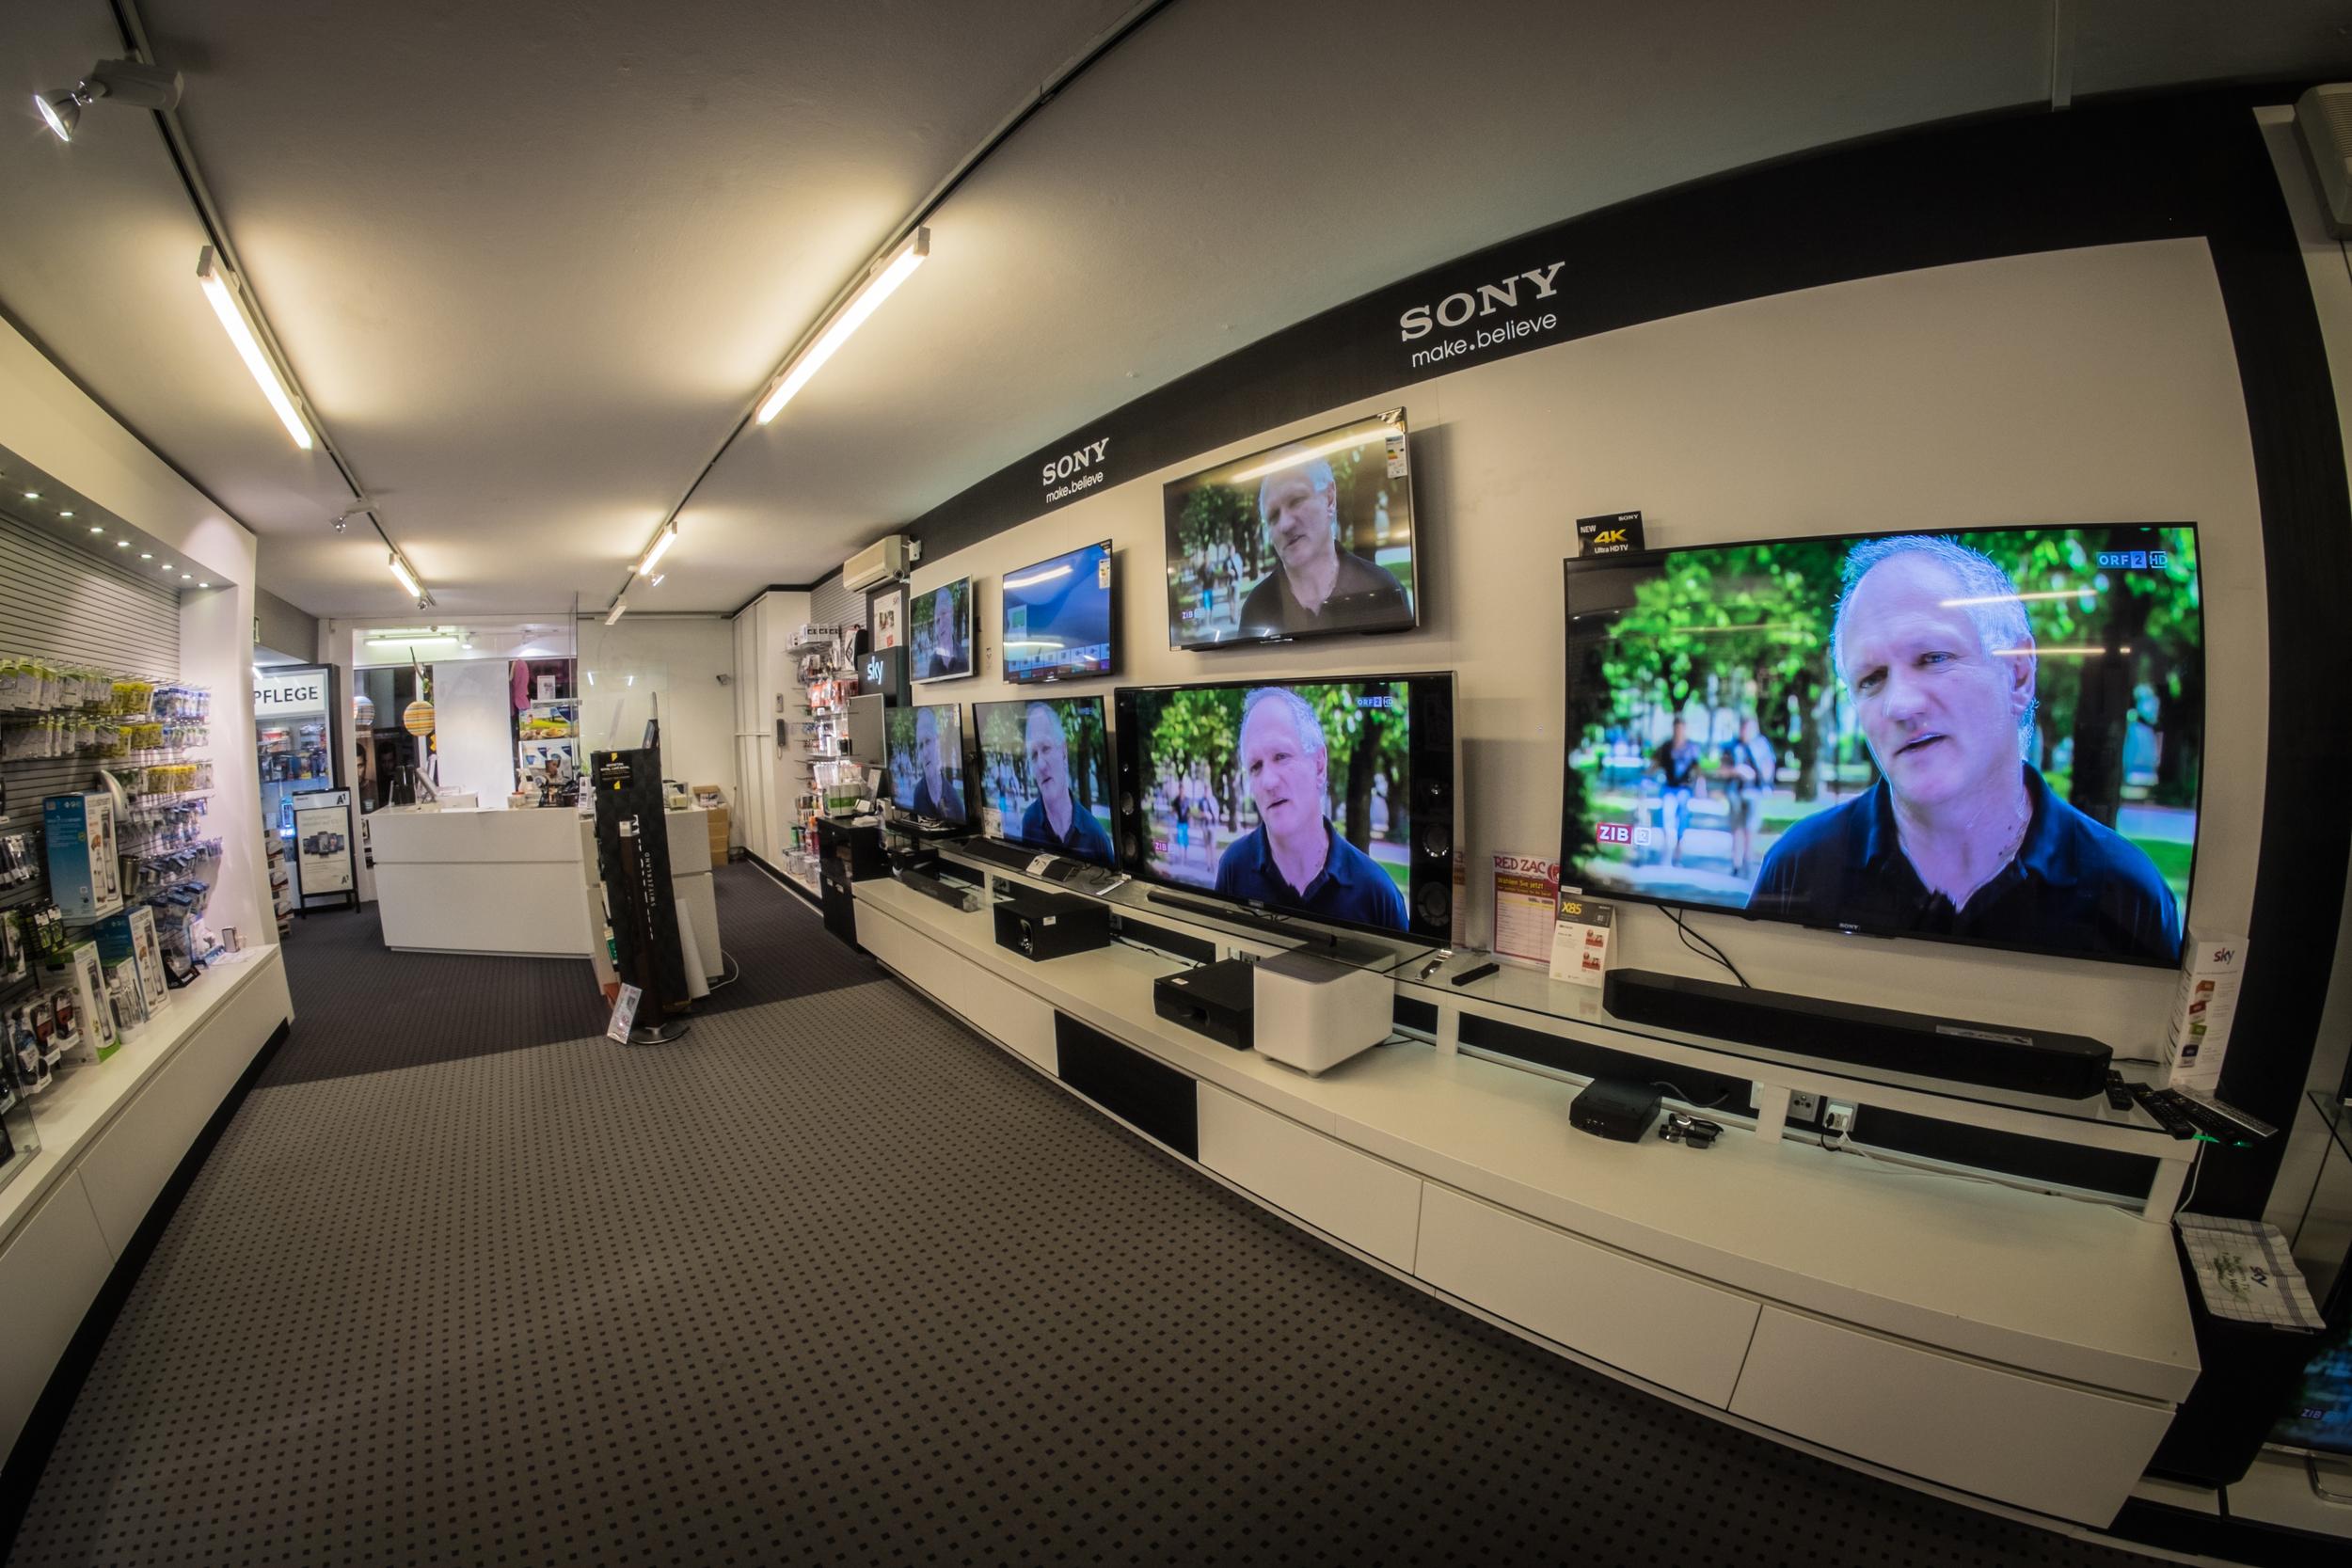 Sonytv&audio